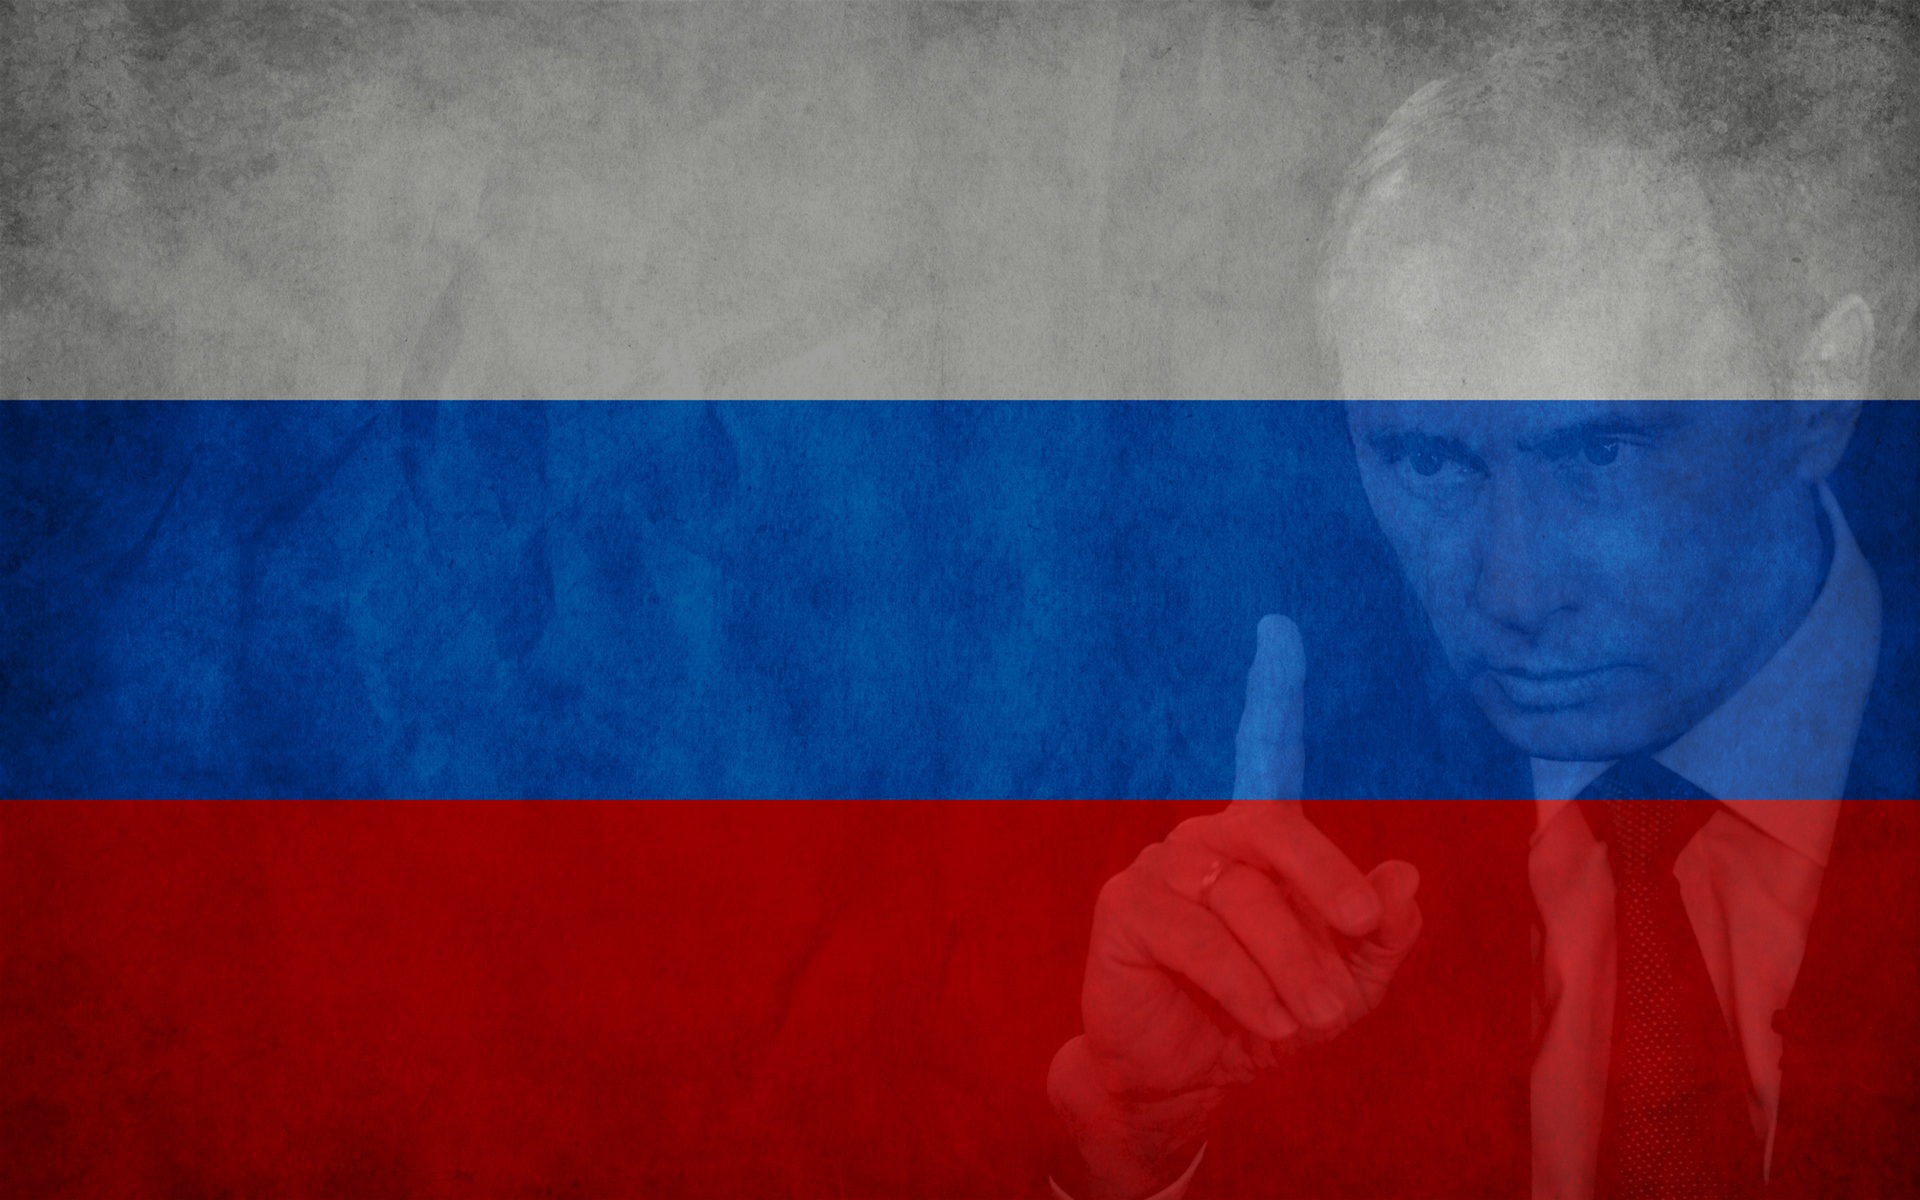 Vladimir Putin Wallpaper By Beefcakepantyhose On Deviantart